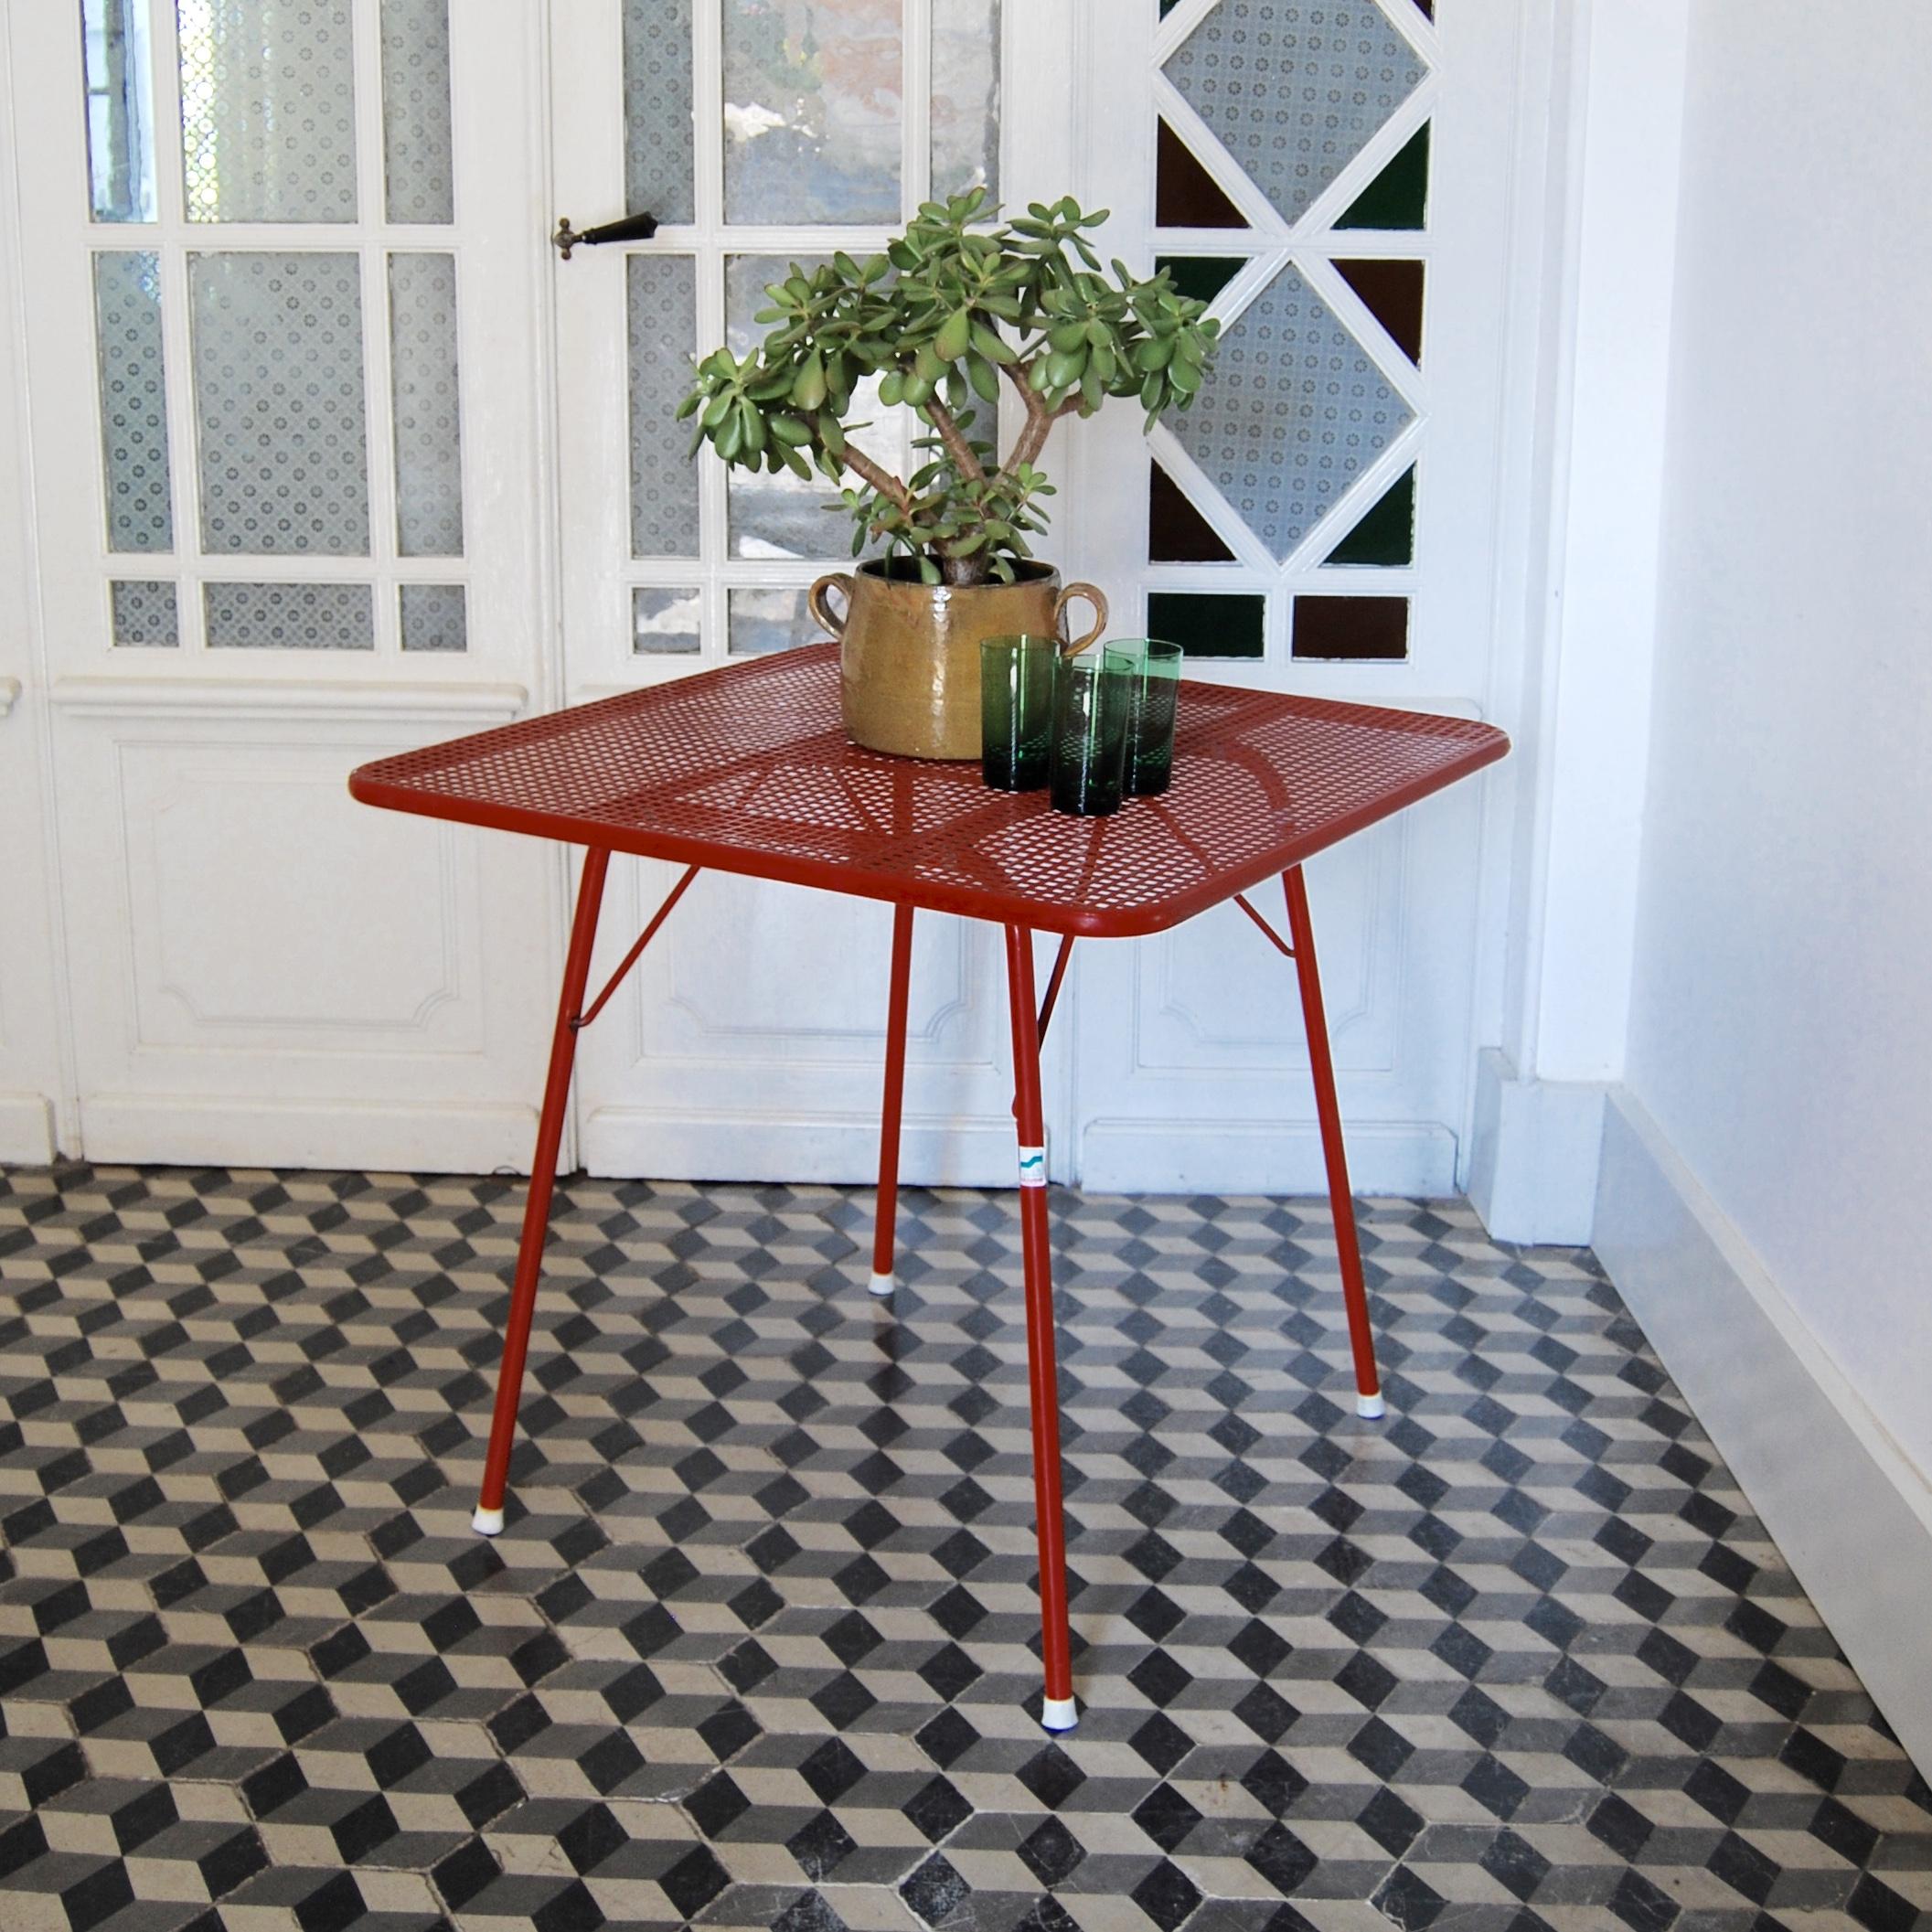 Table pliante en métal rouge type Malaval - Brocante Avenue